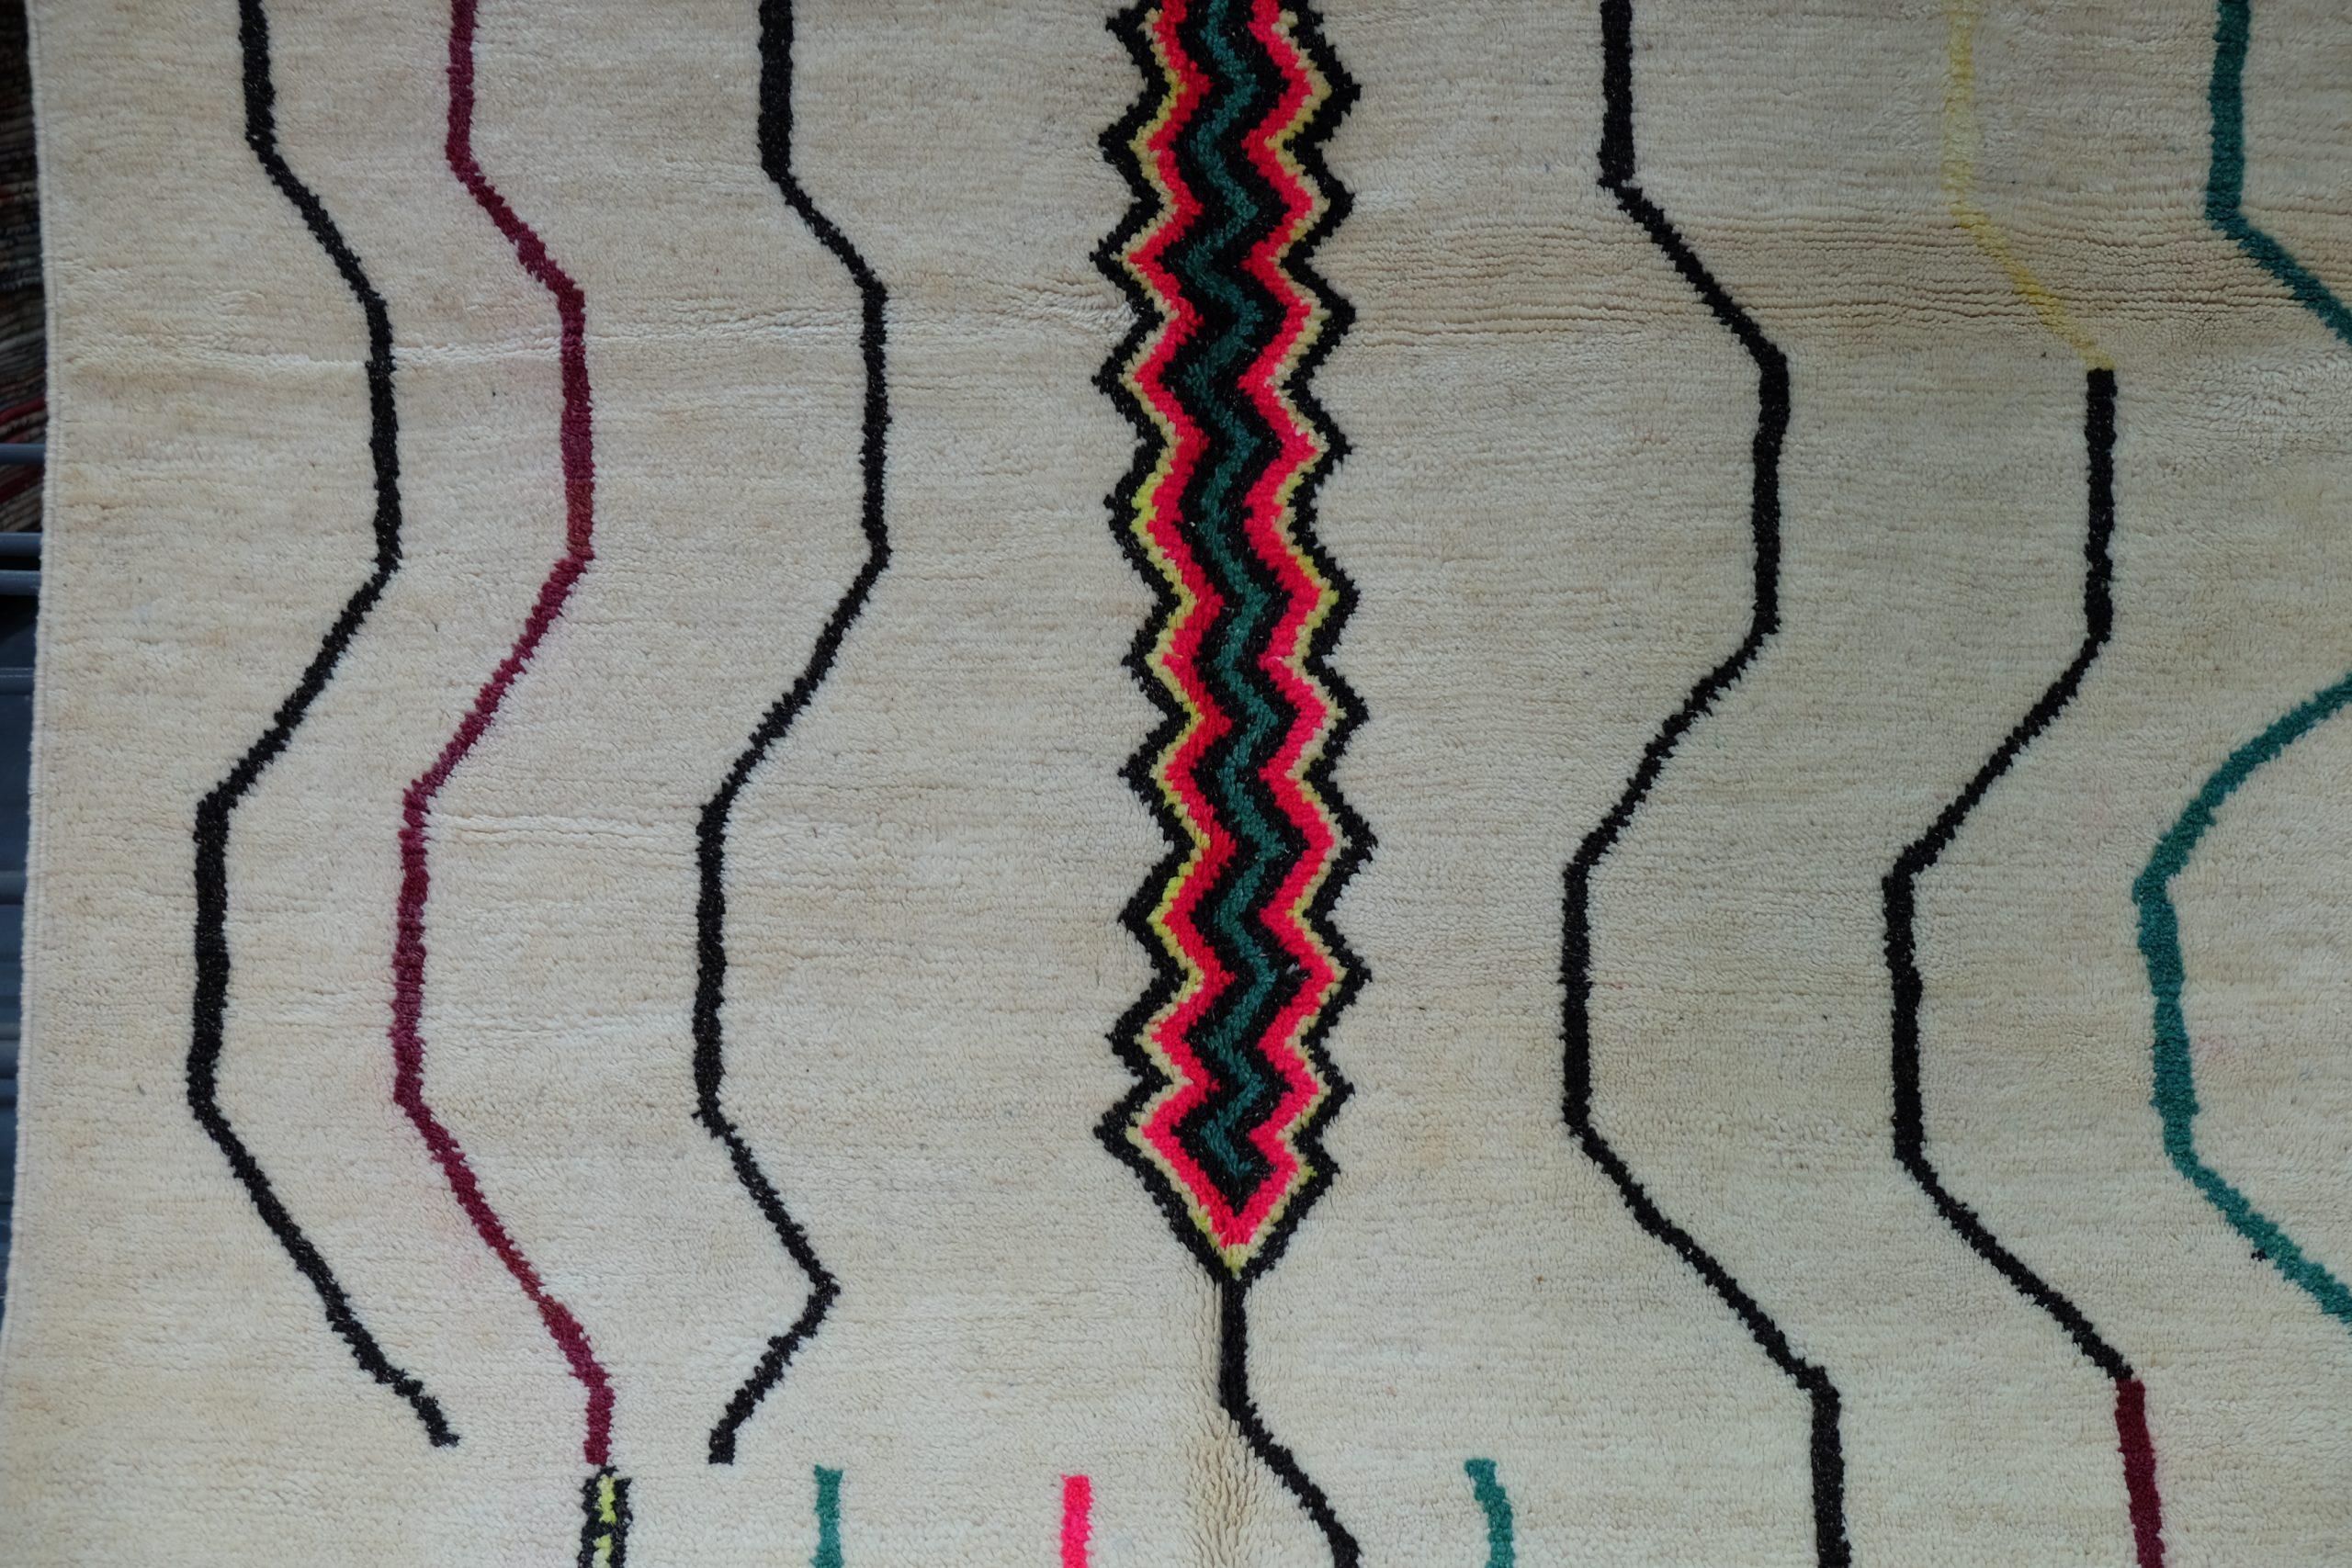 Handmade Geometric Mrirt Colored Rug 10.6 ft x 6.65 ft